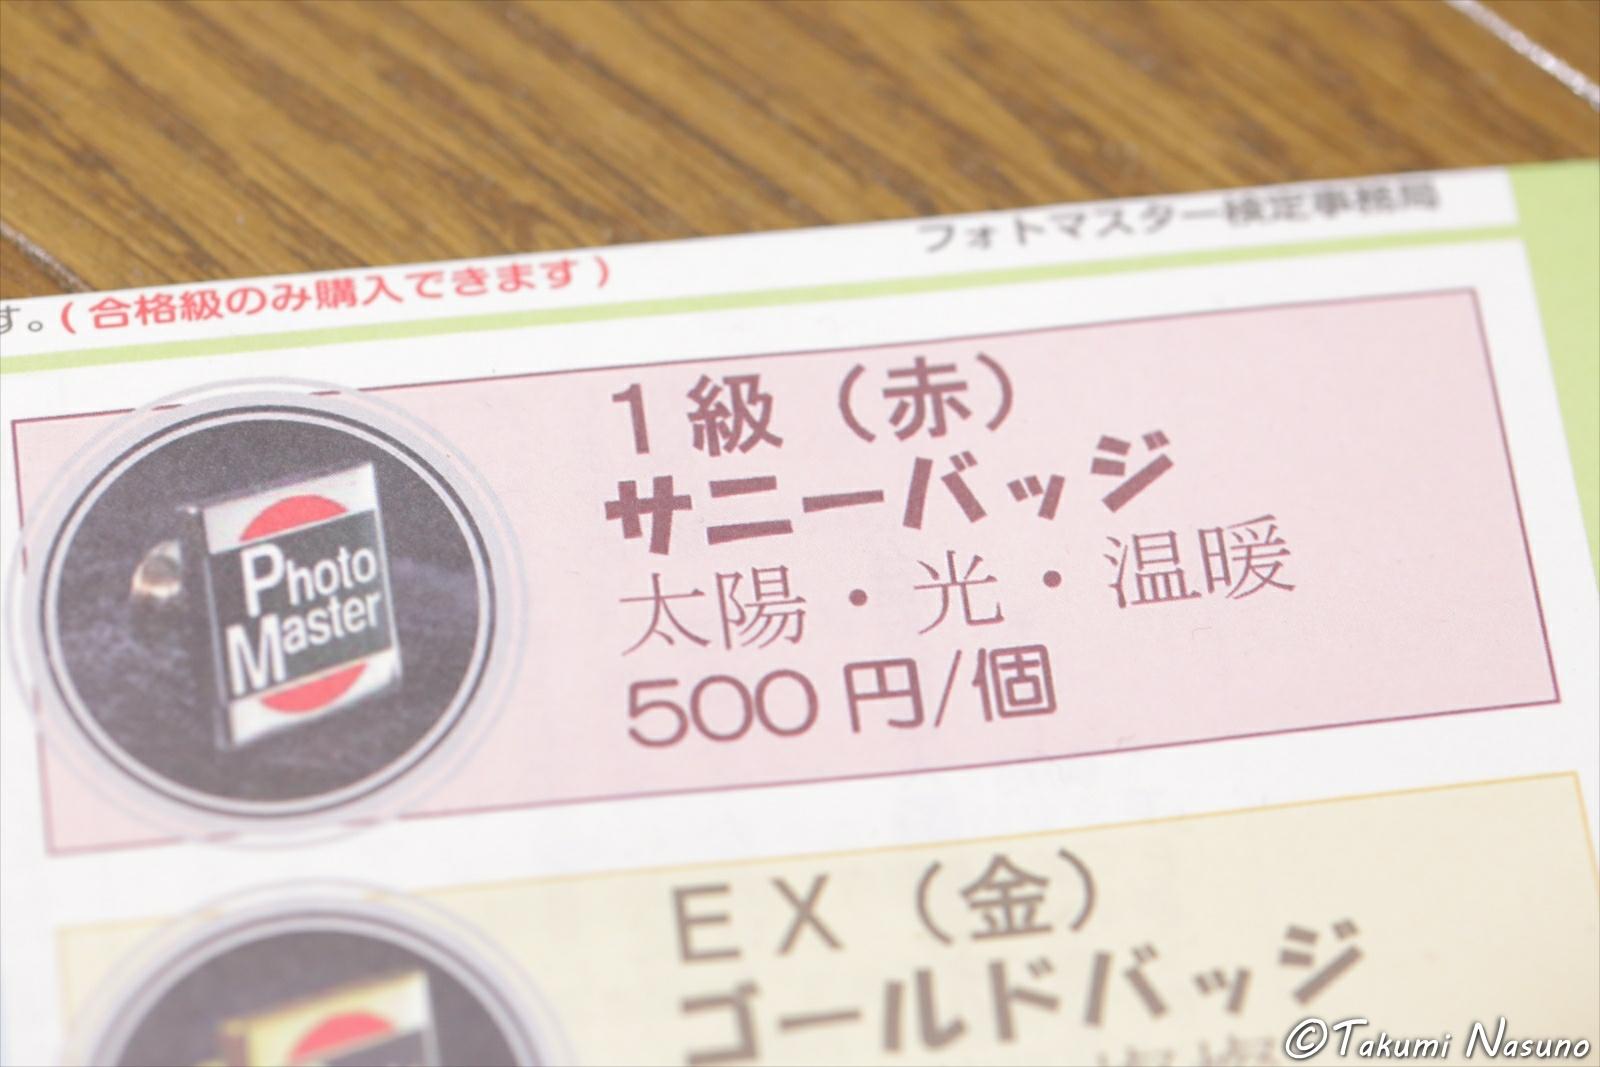 Photomaster Badge